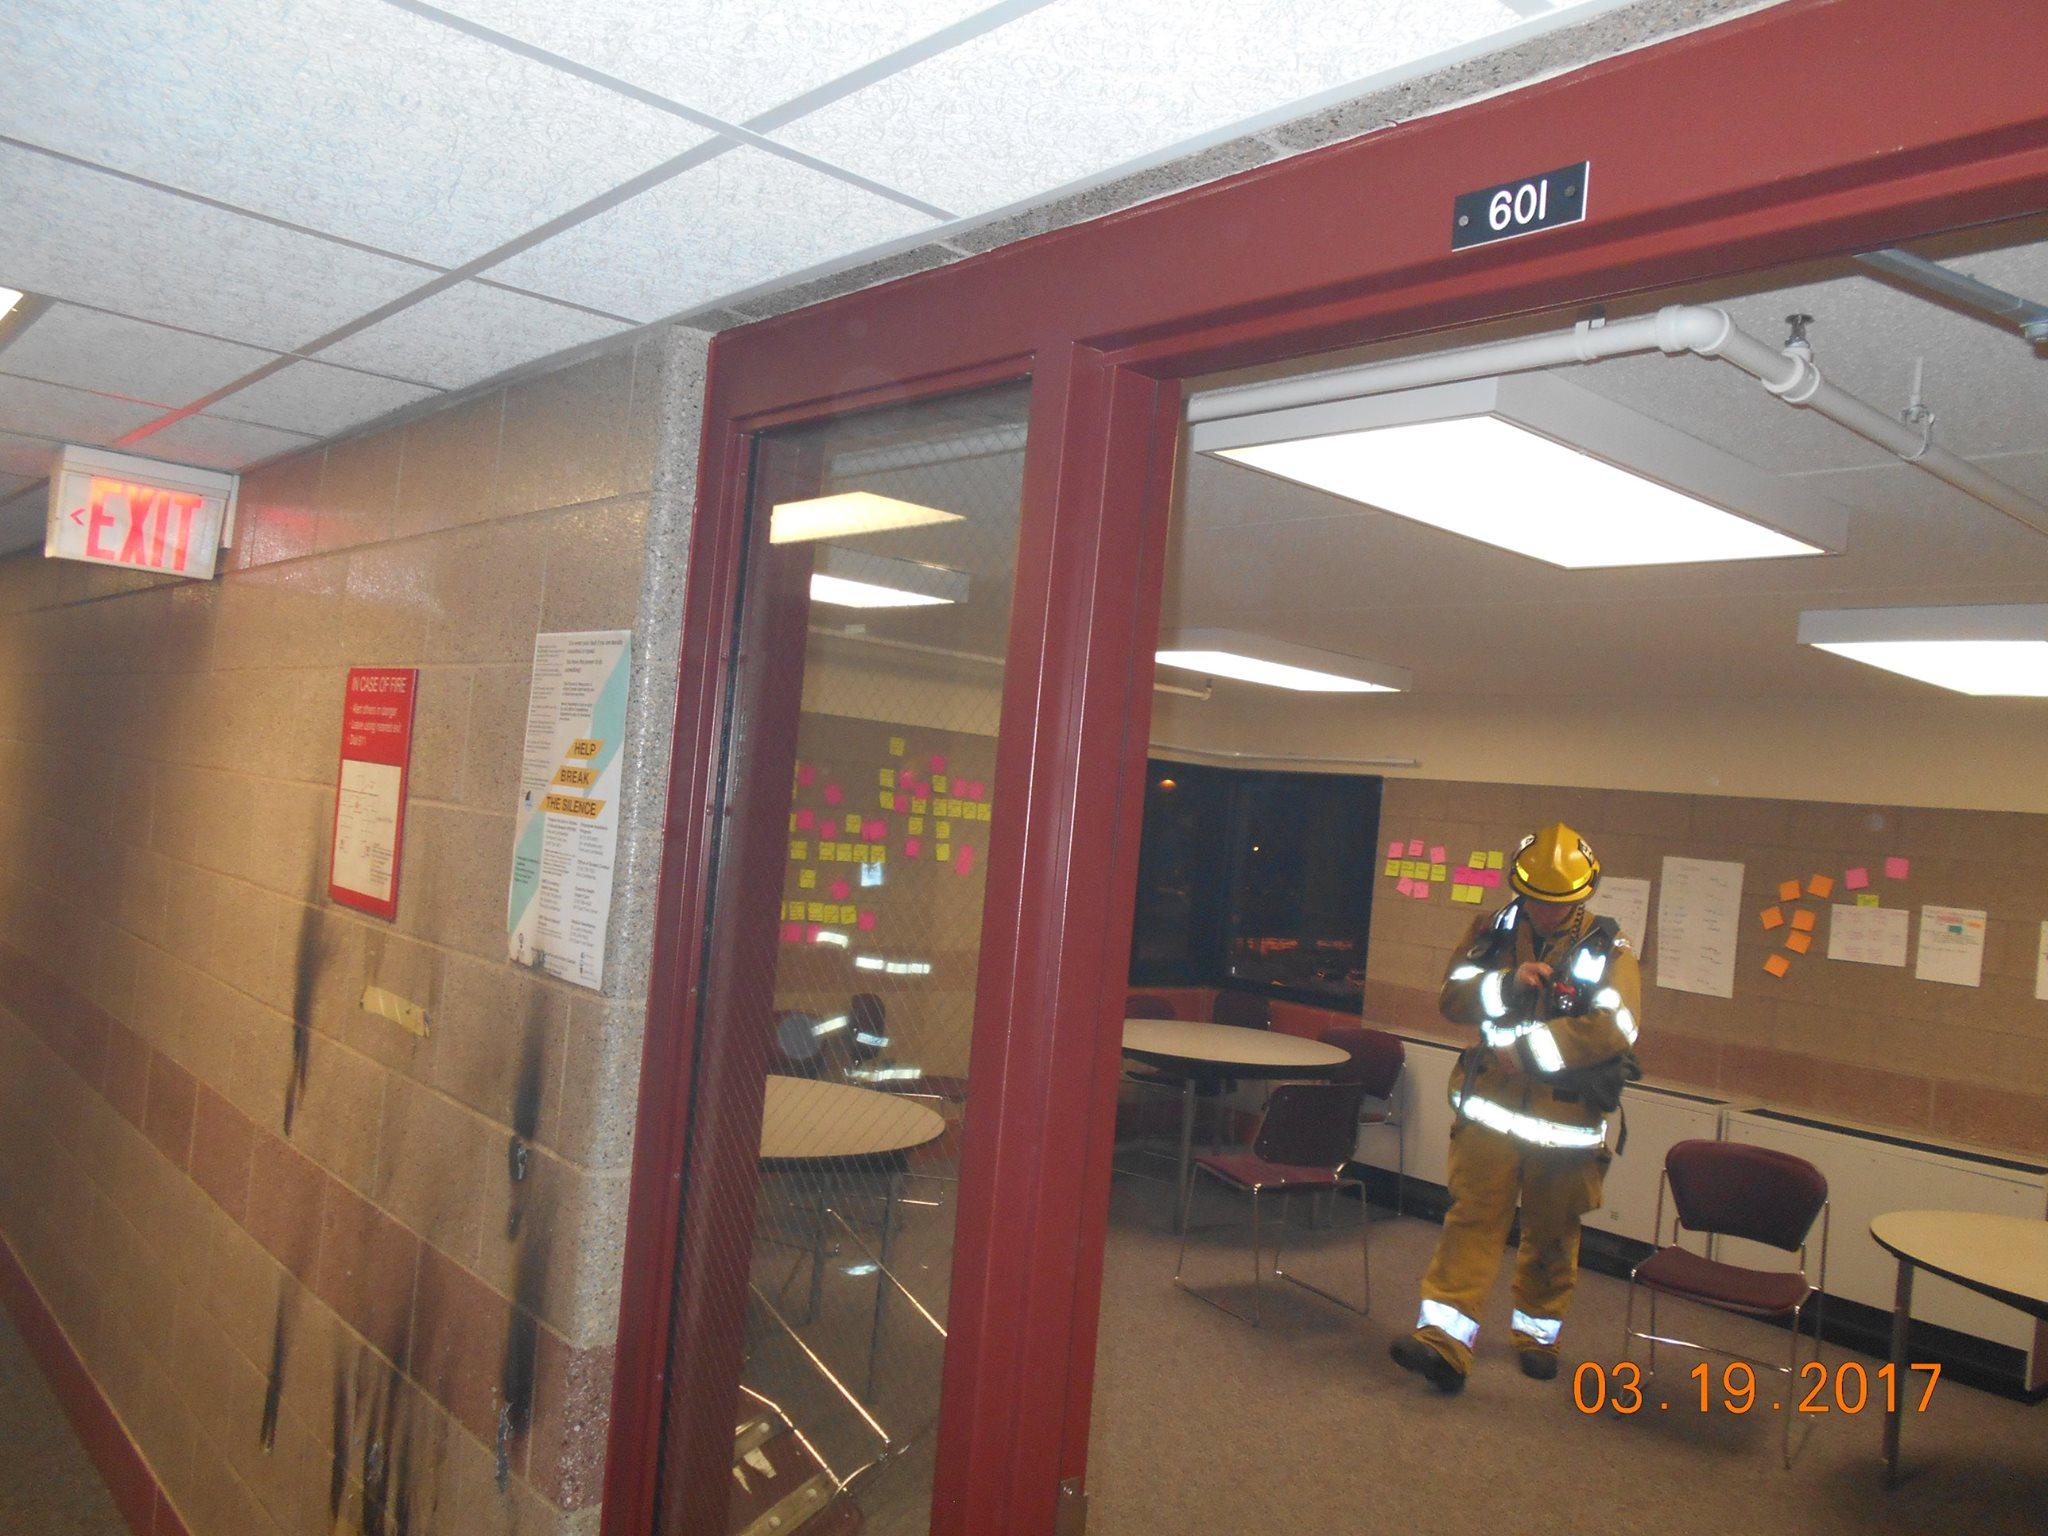 Police Fire Department Investigating Arson At Umd Kbjr 6 Your